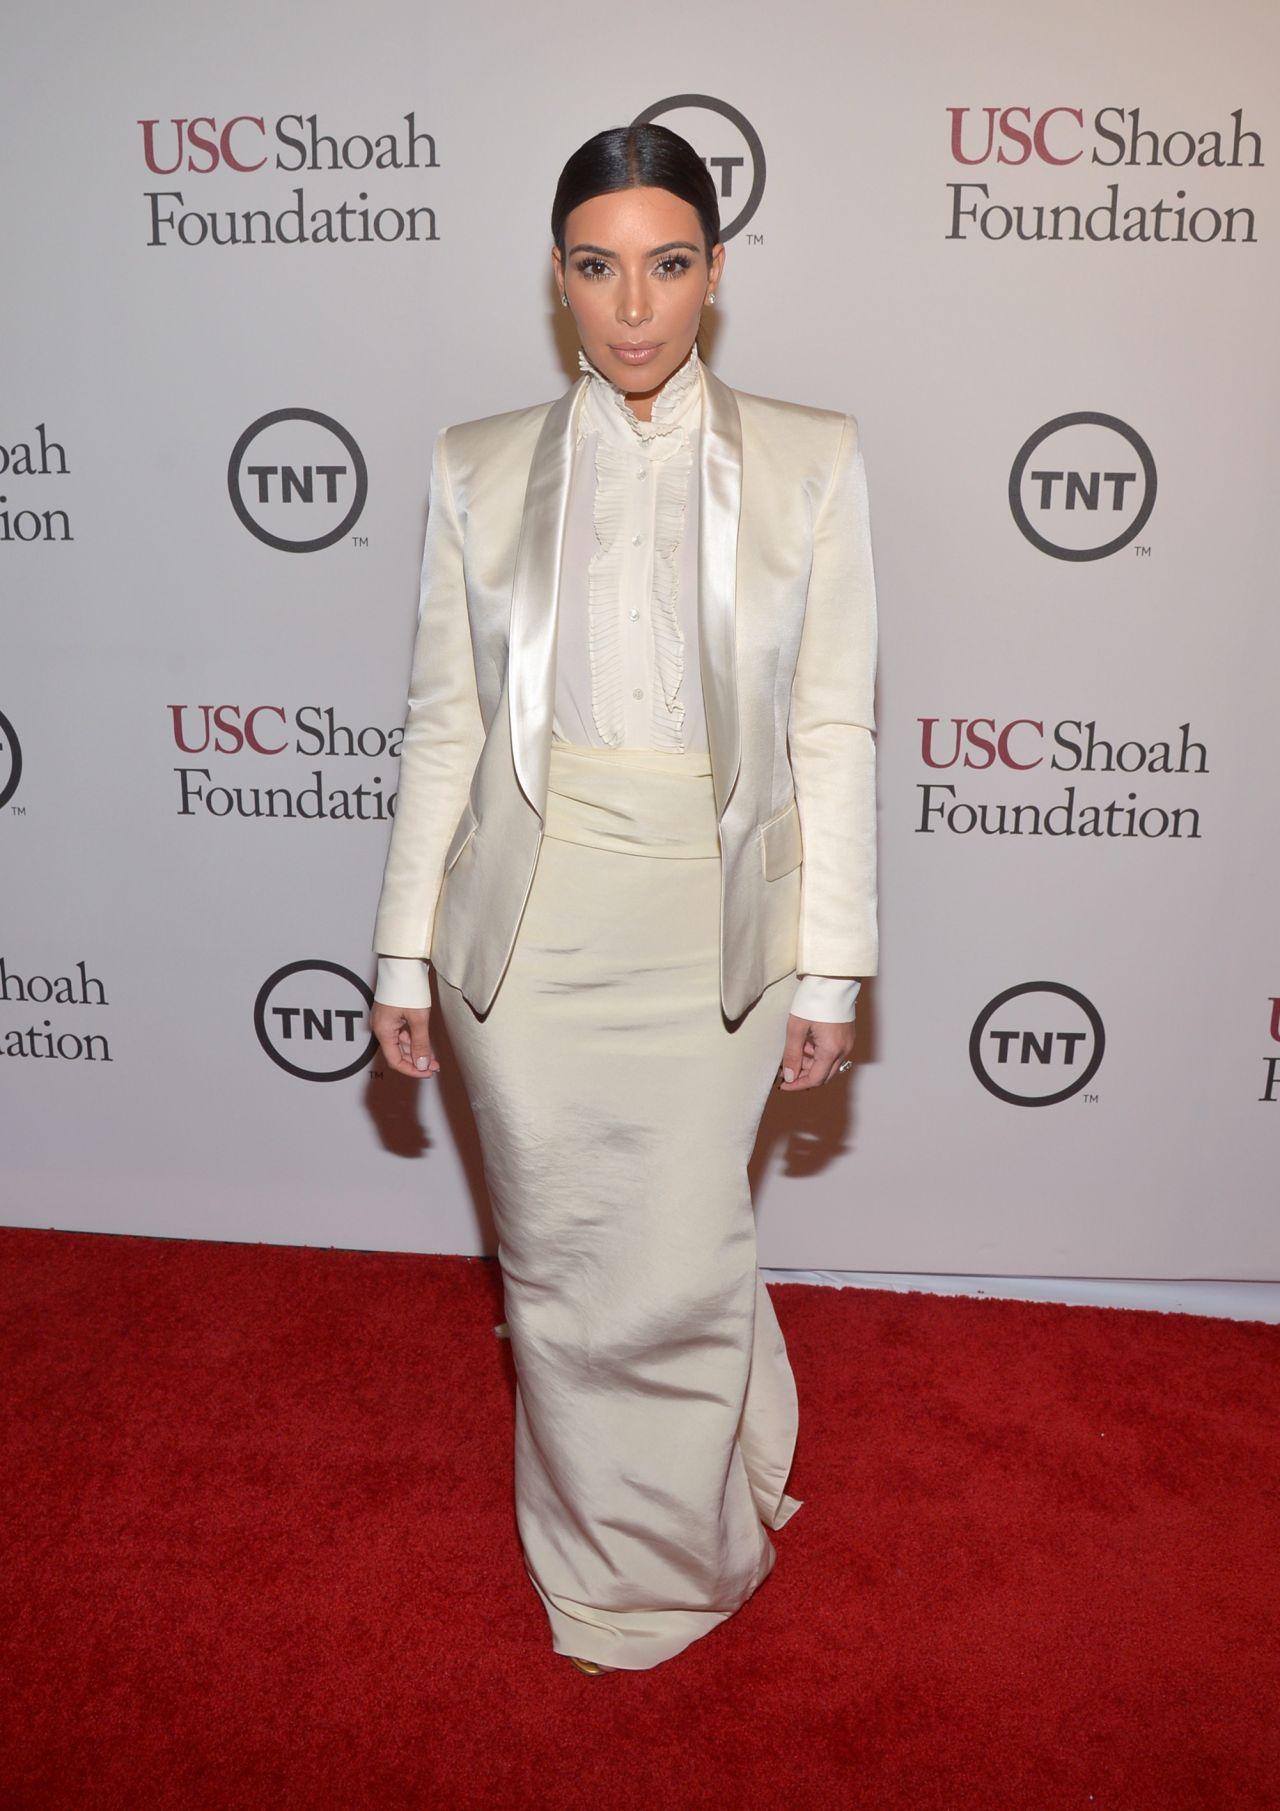 Kim Kardashian Wearing  Balmain, Alexander McQueen & Lanvin - 2014 USC Shoah Foundation